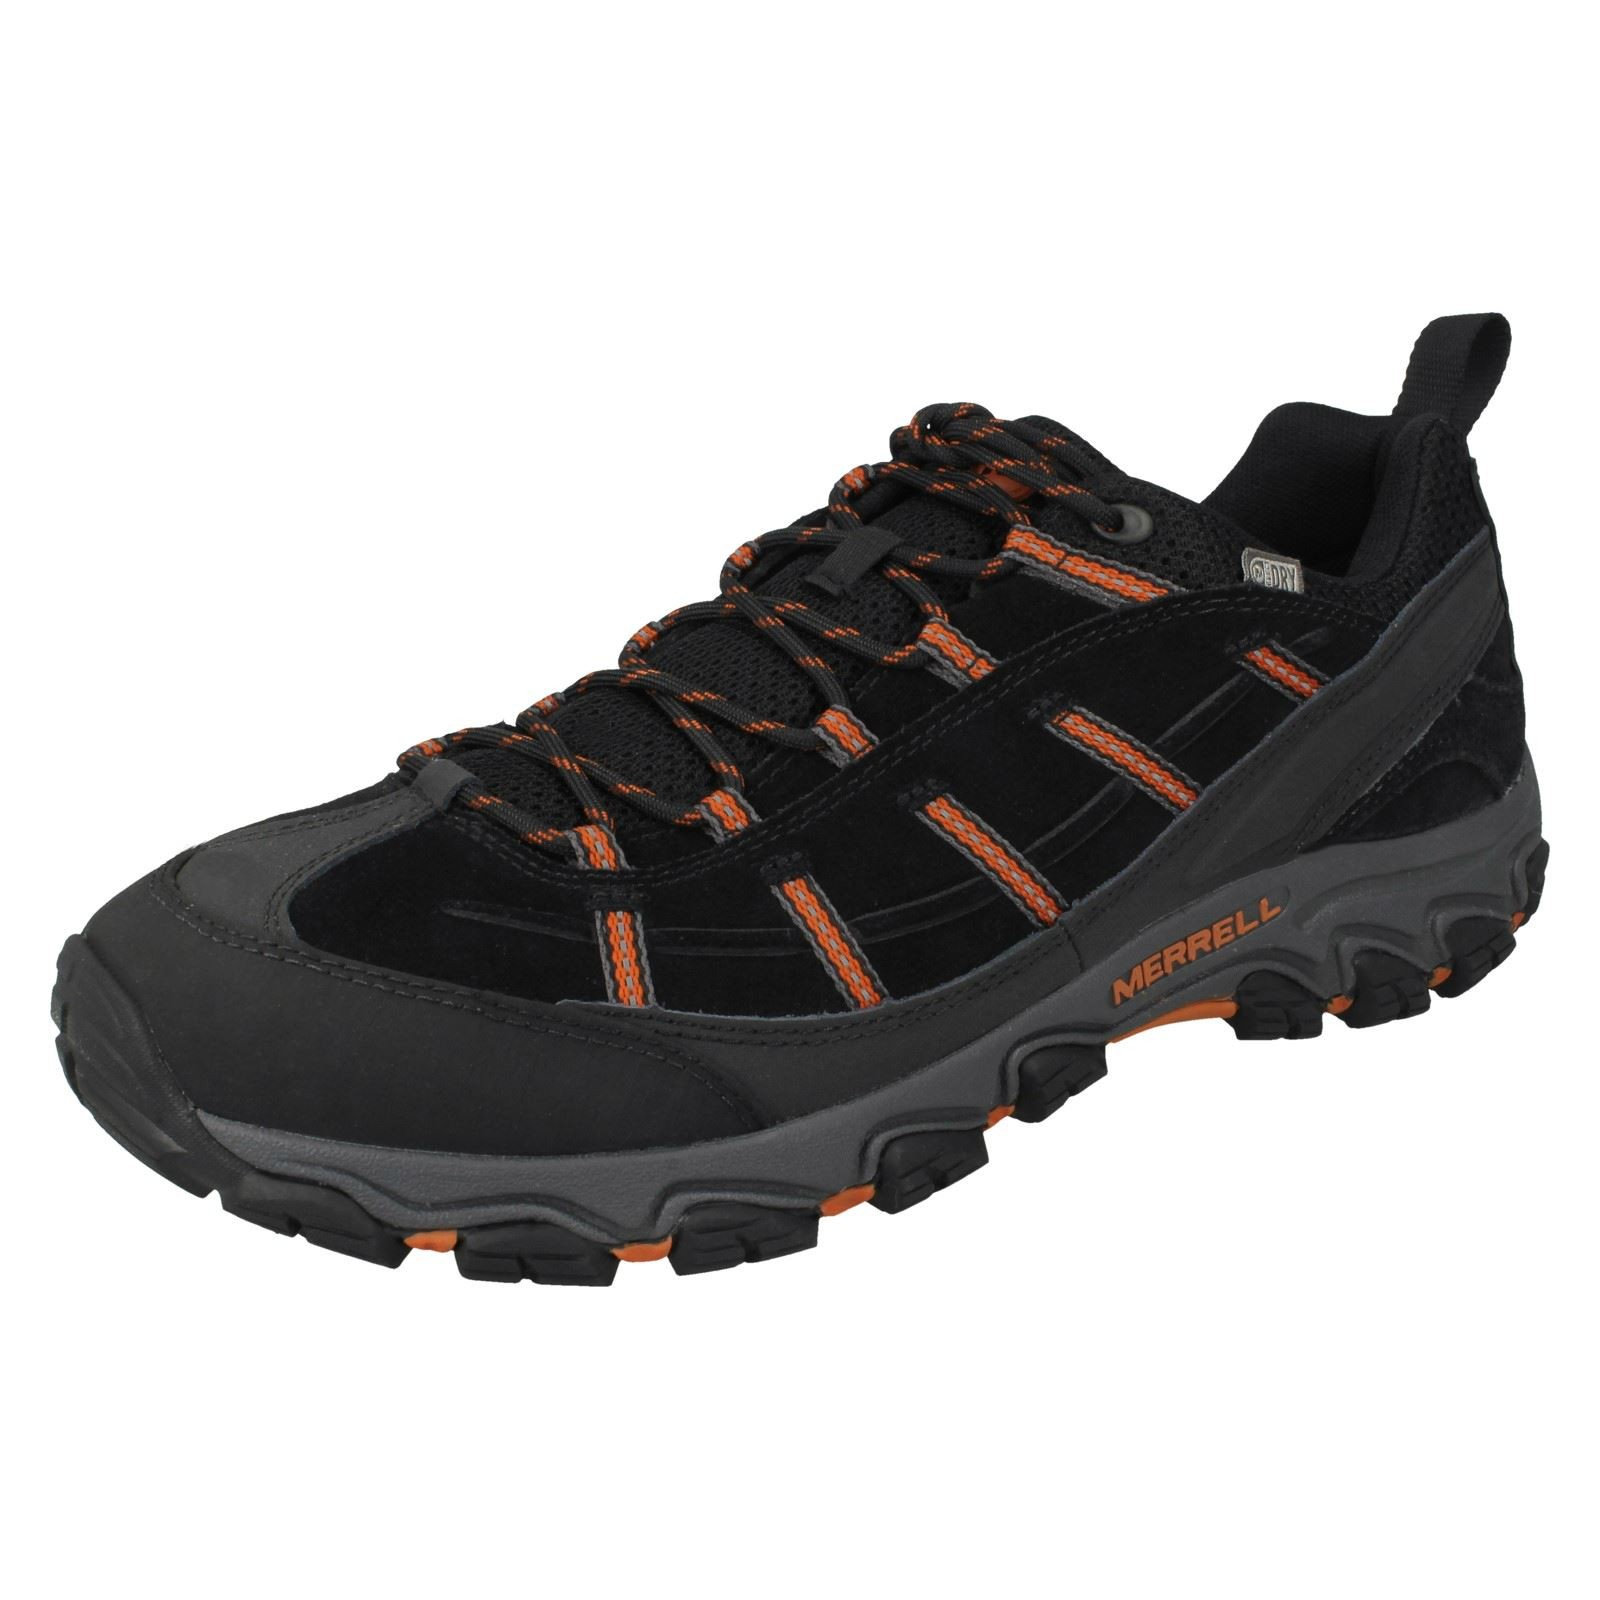 Herren Merrell Terramorph Waterproof Walking Walking Waterproof Trainers 6a79ce